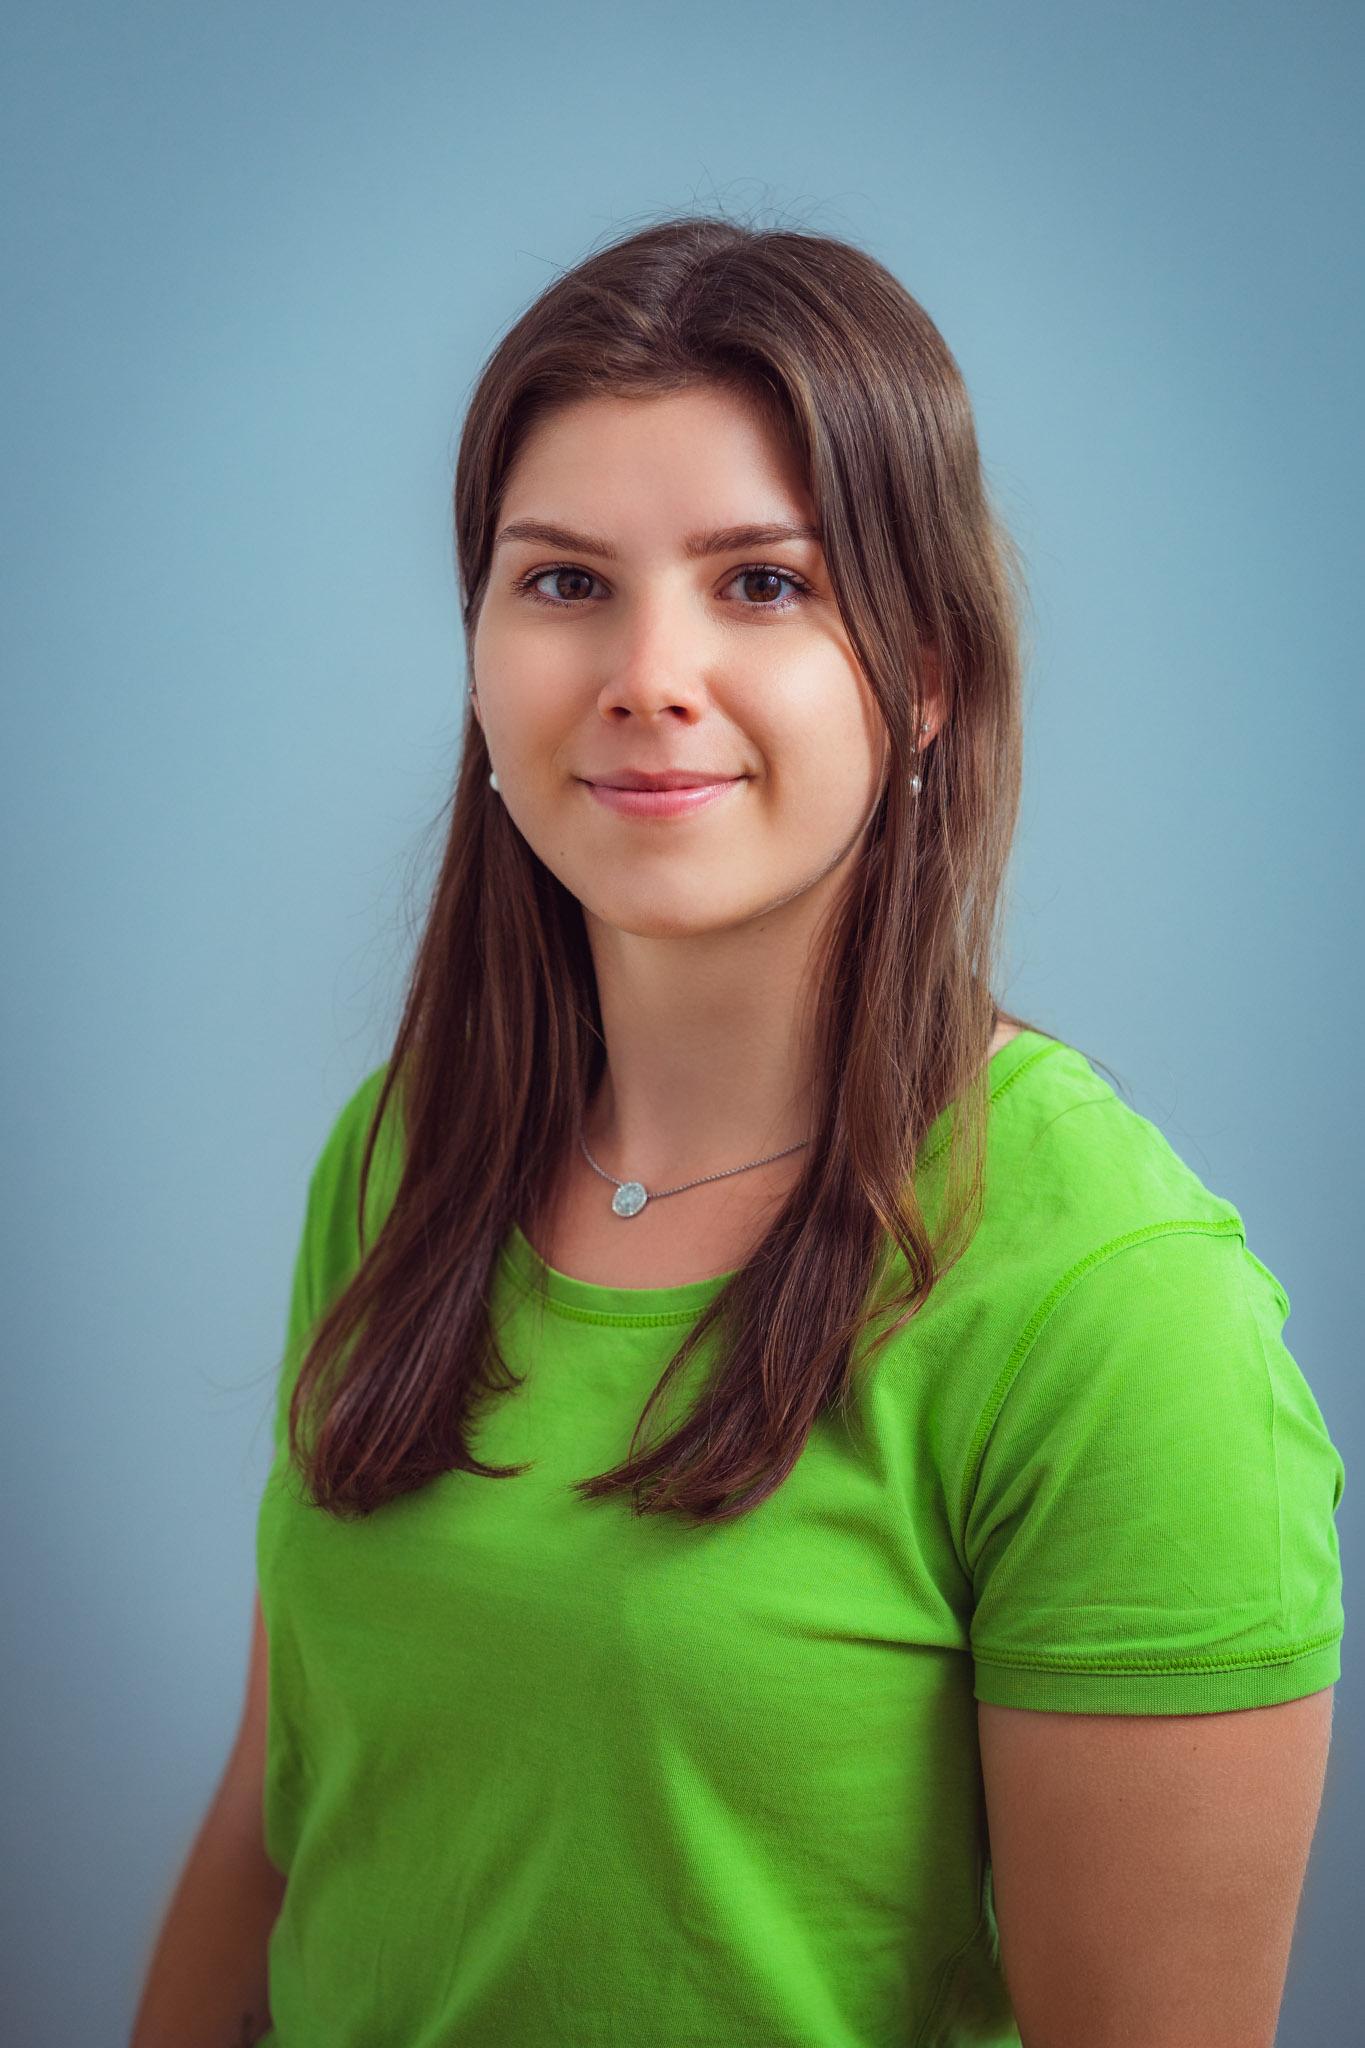 Mitarbeiterfoto 07.2021 Lena Hünies web